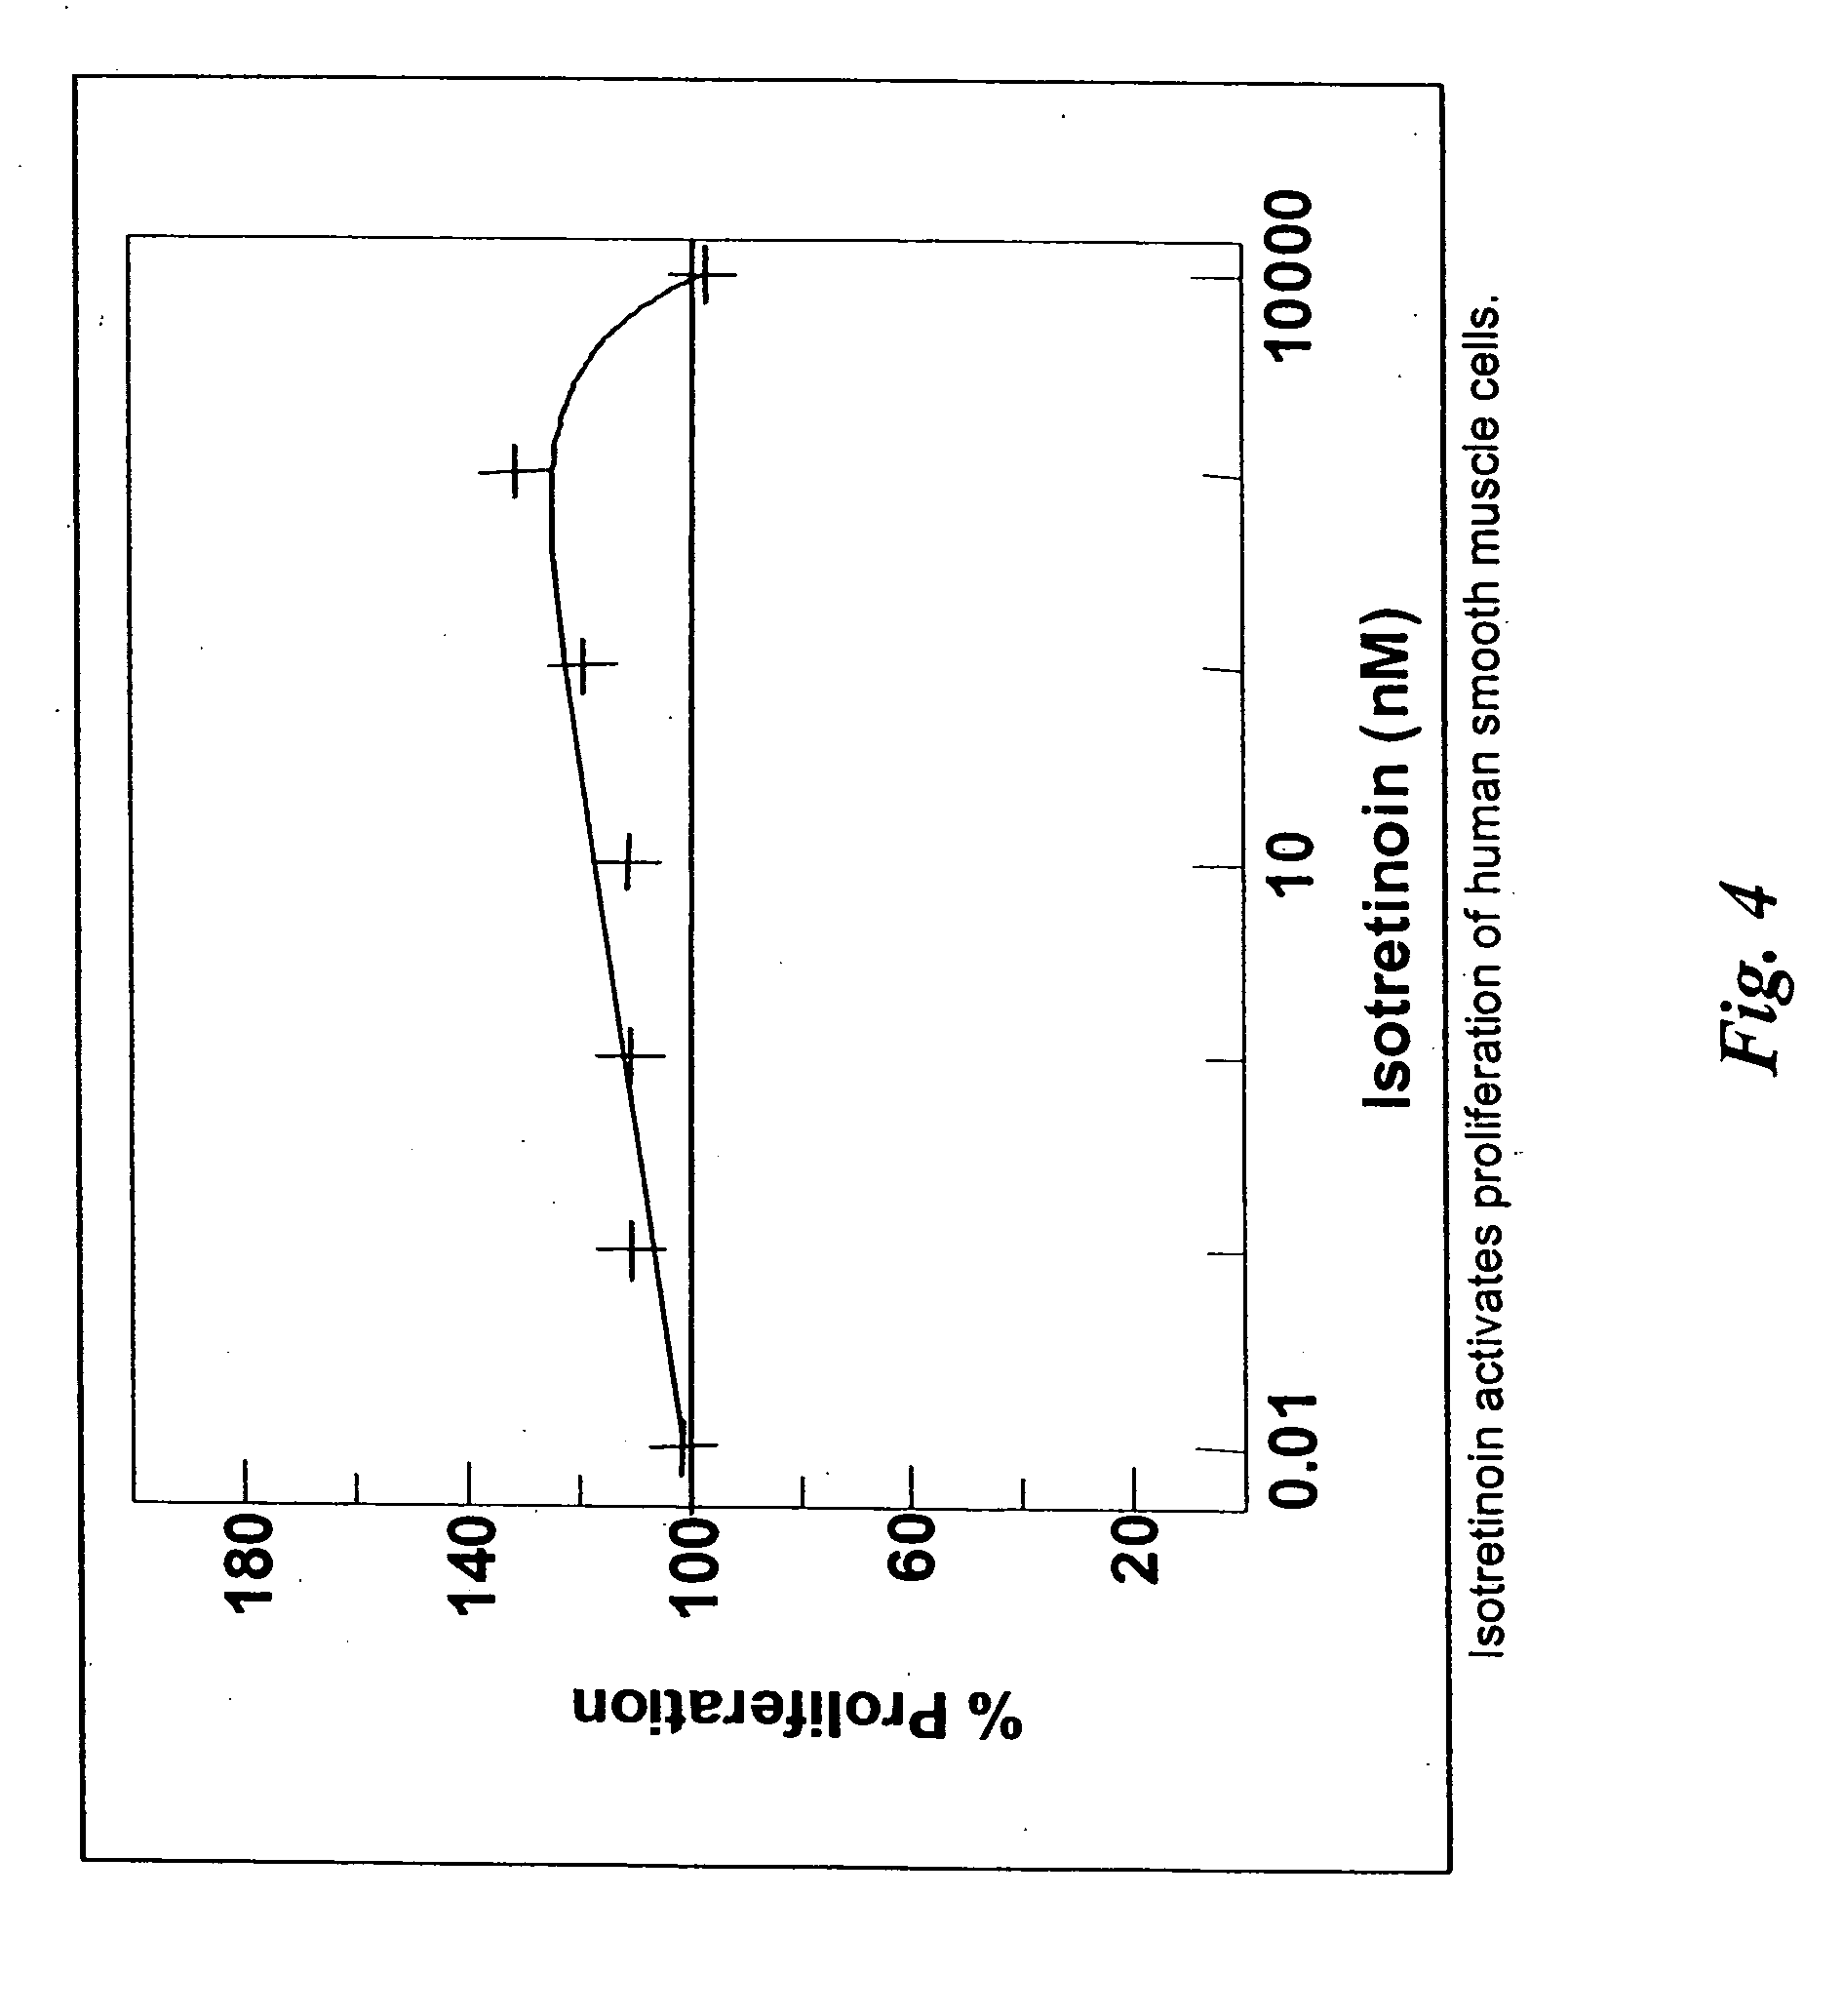 Patent US 20050169958A1